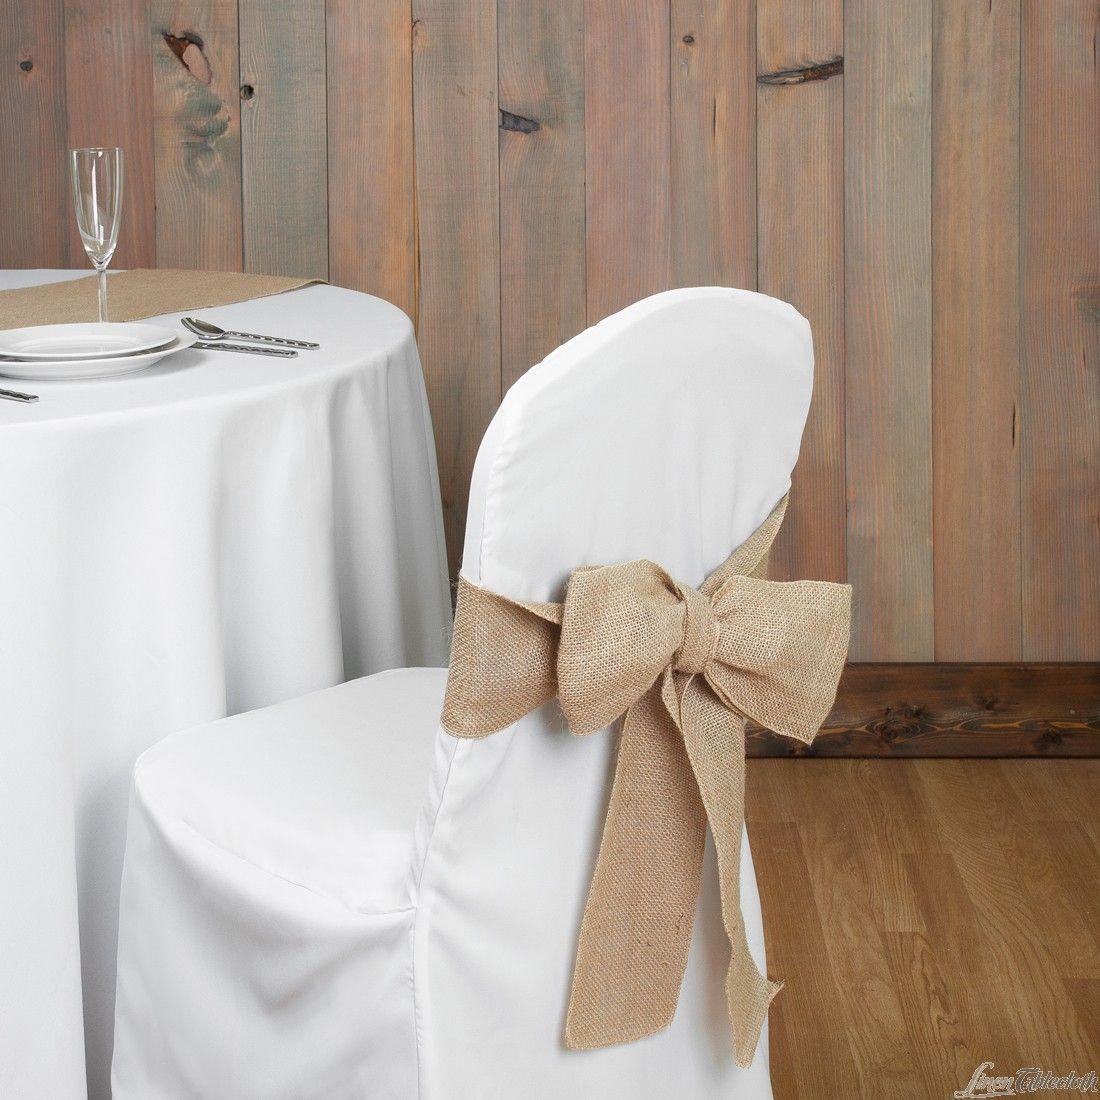 Table Linens Linen Tablecloth Shopping Linentablecloth